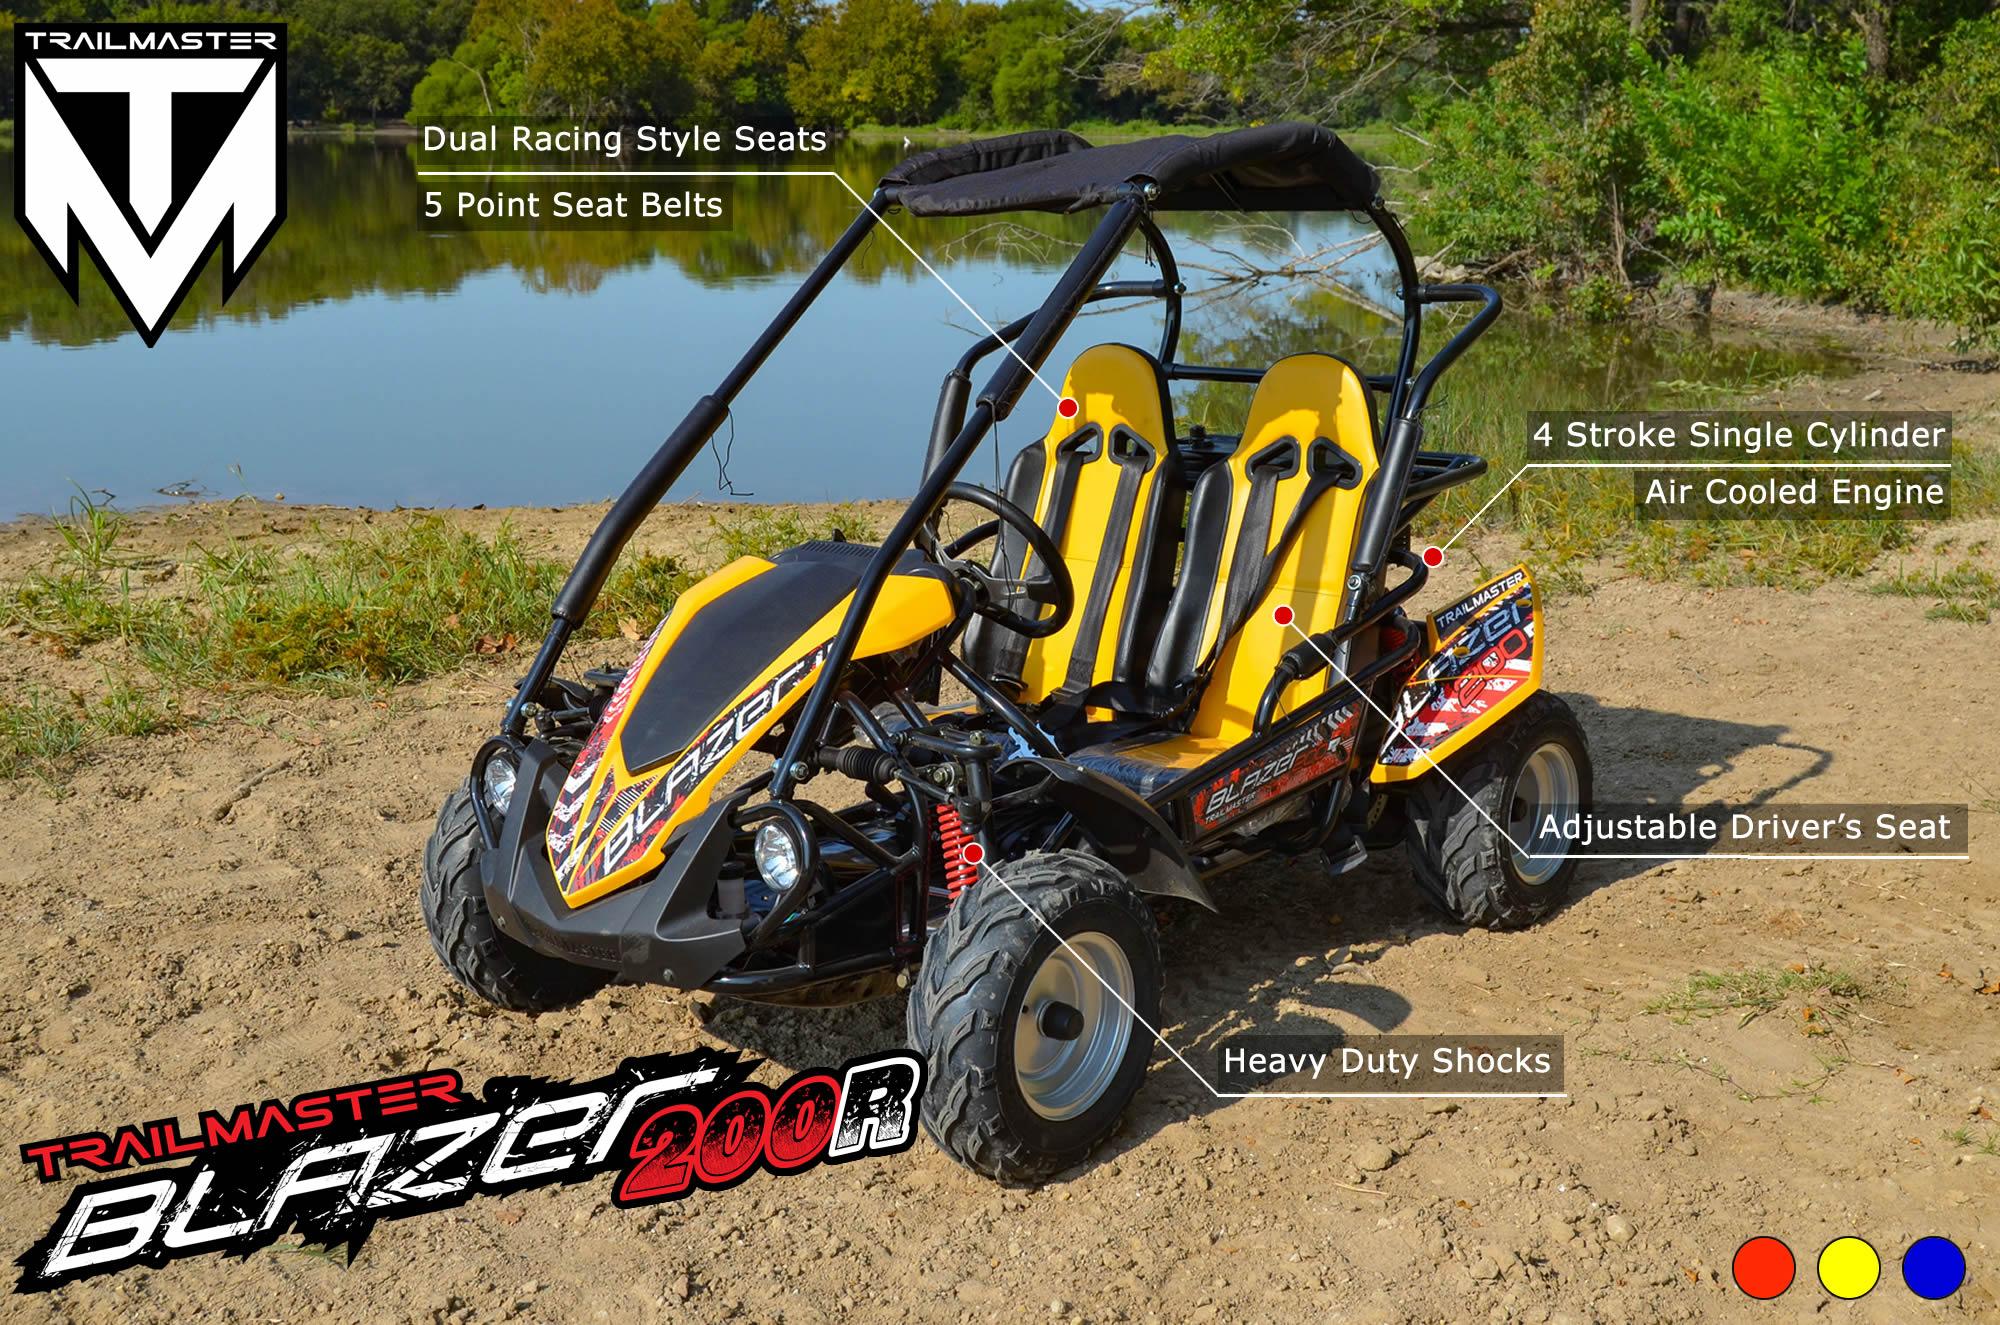 blazer200r